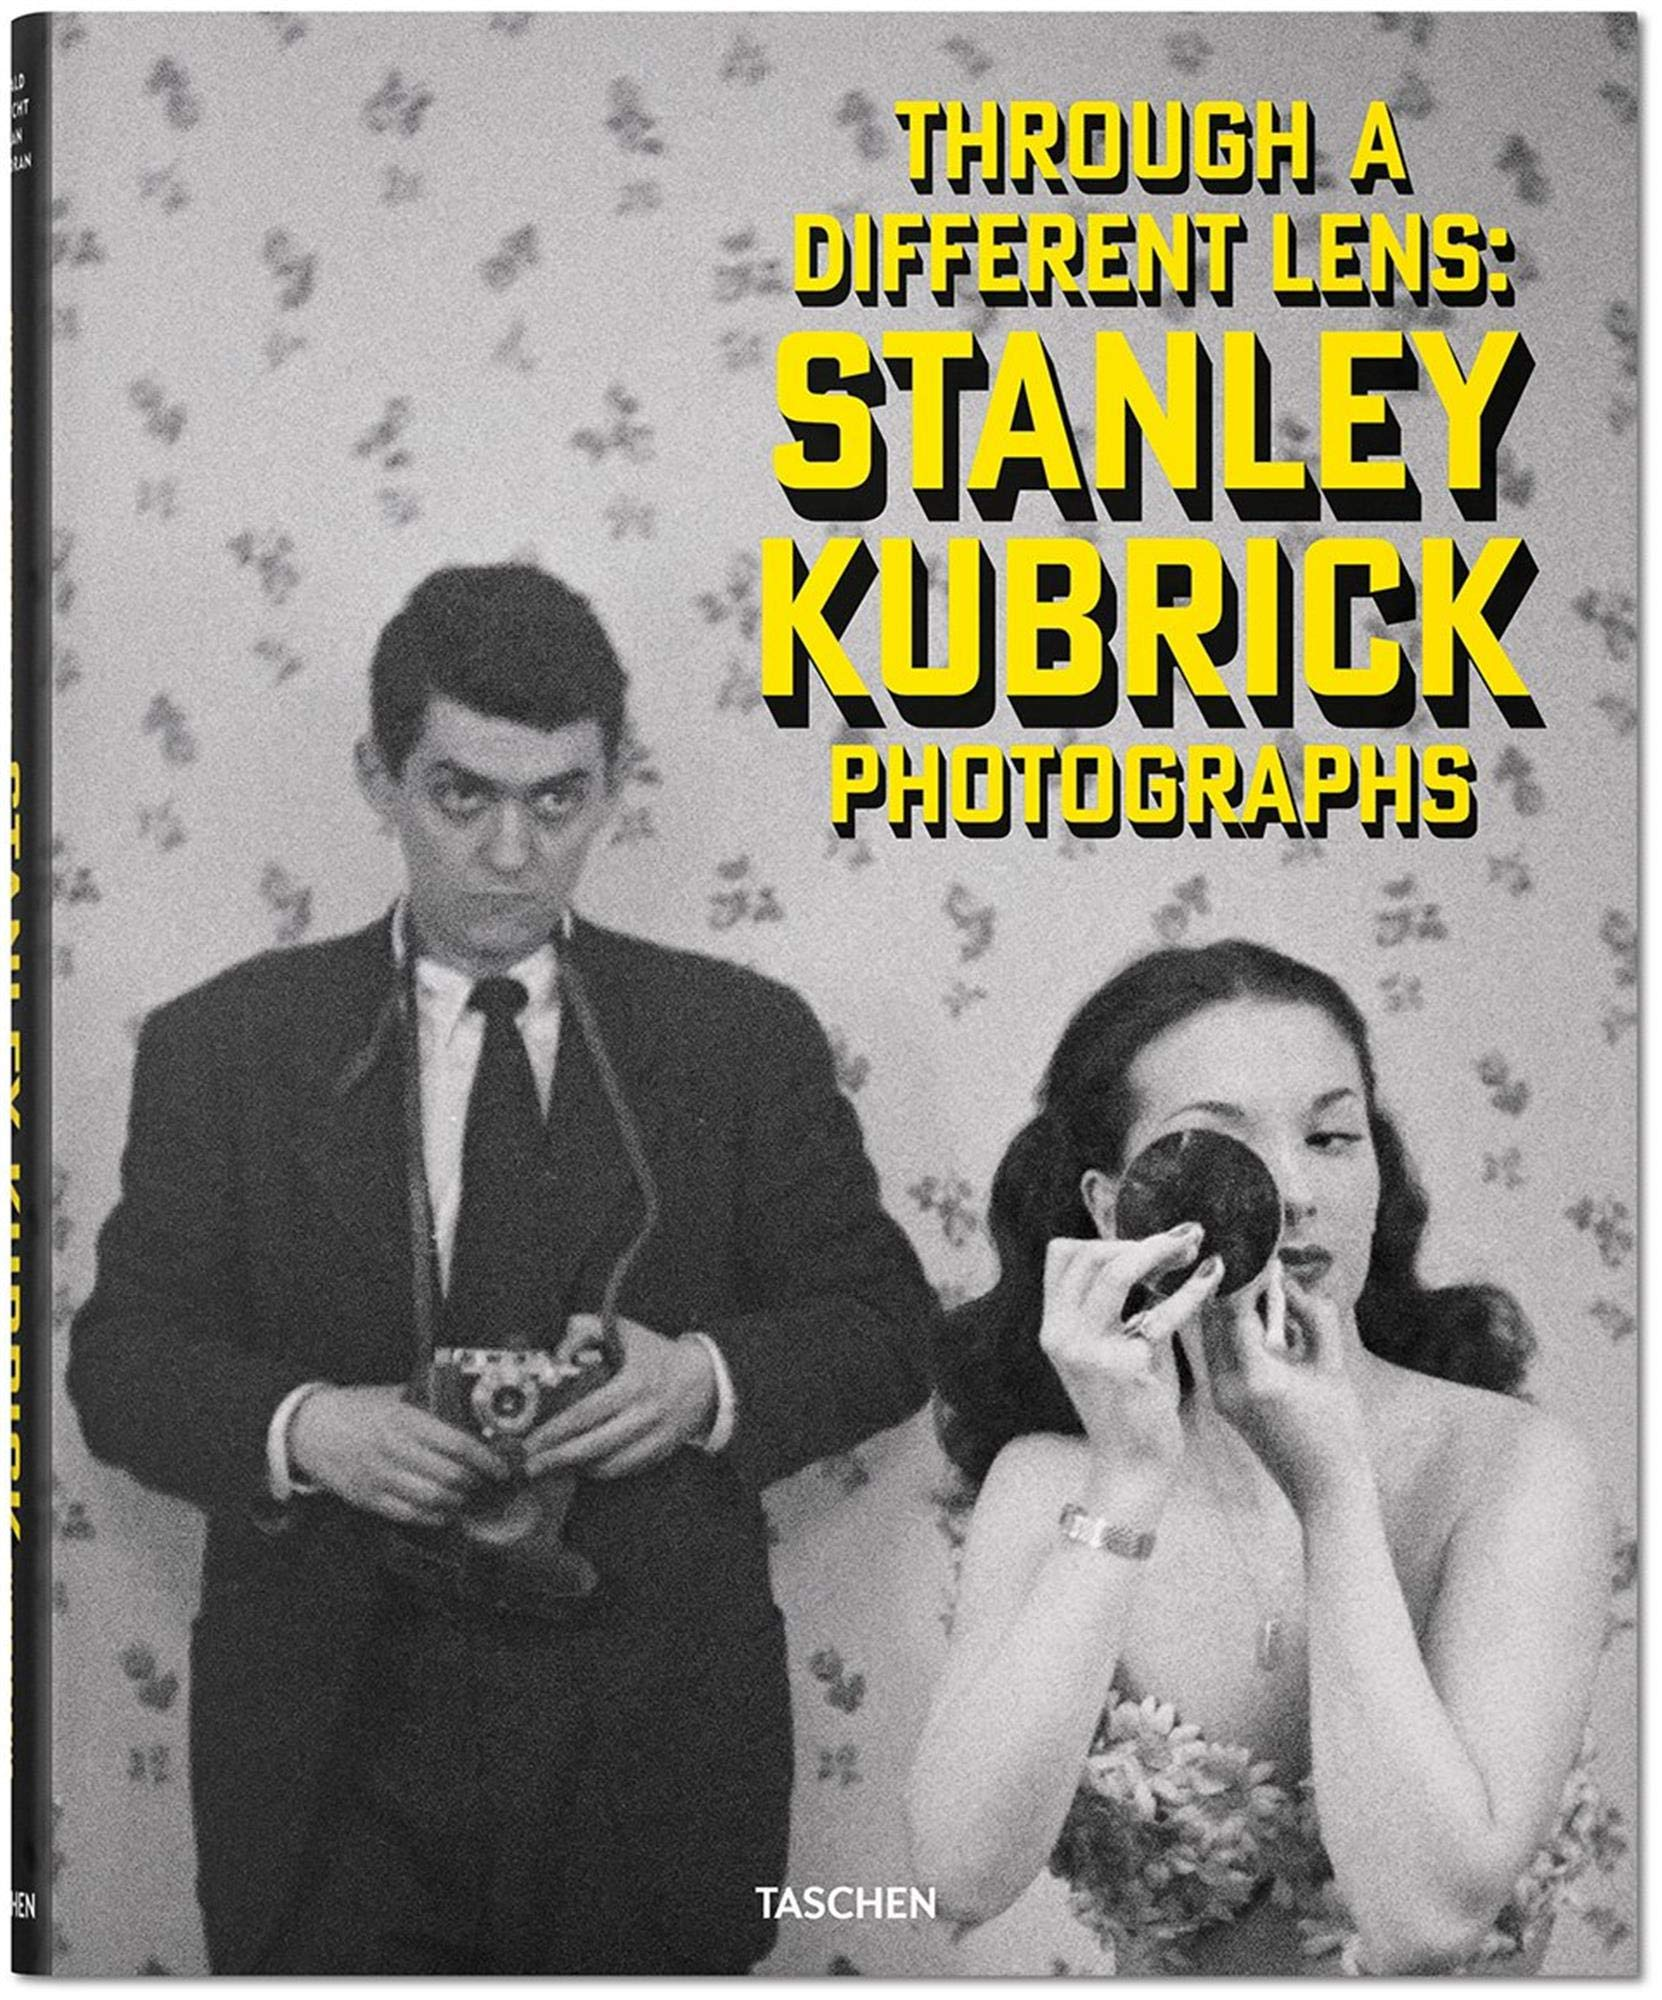 Stanley Kubrick Photographs: Through a Different Lens pdf